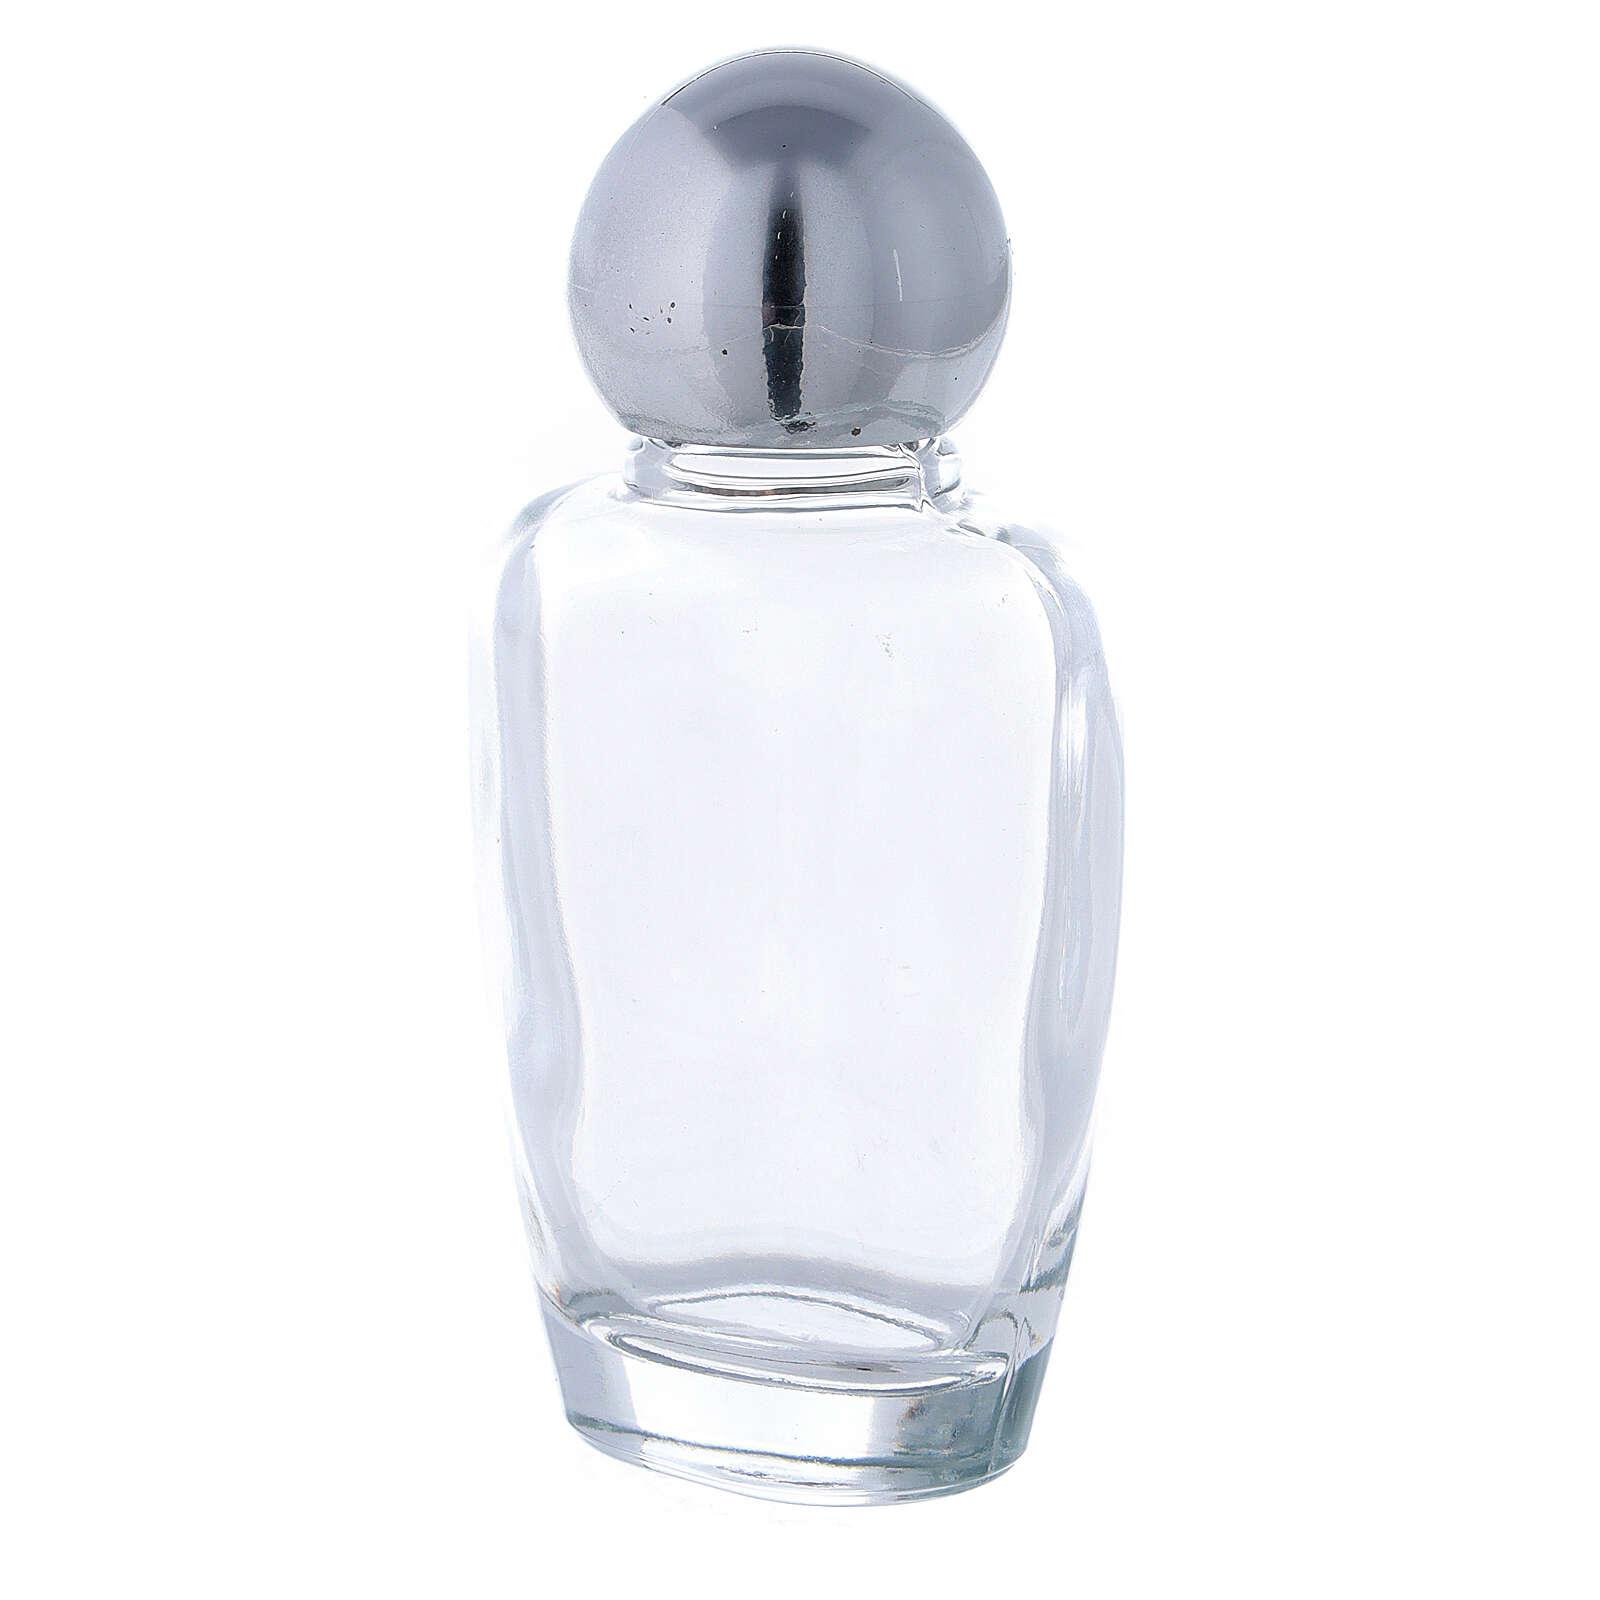 Botella agua bendita vidrio 30 ml (CAJA 50 PIEZAS) 3